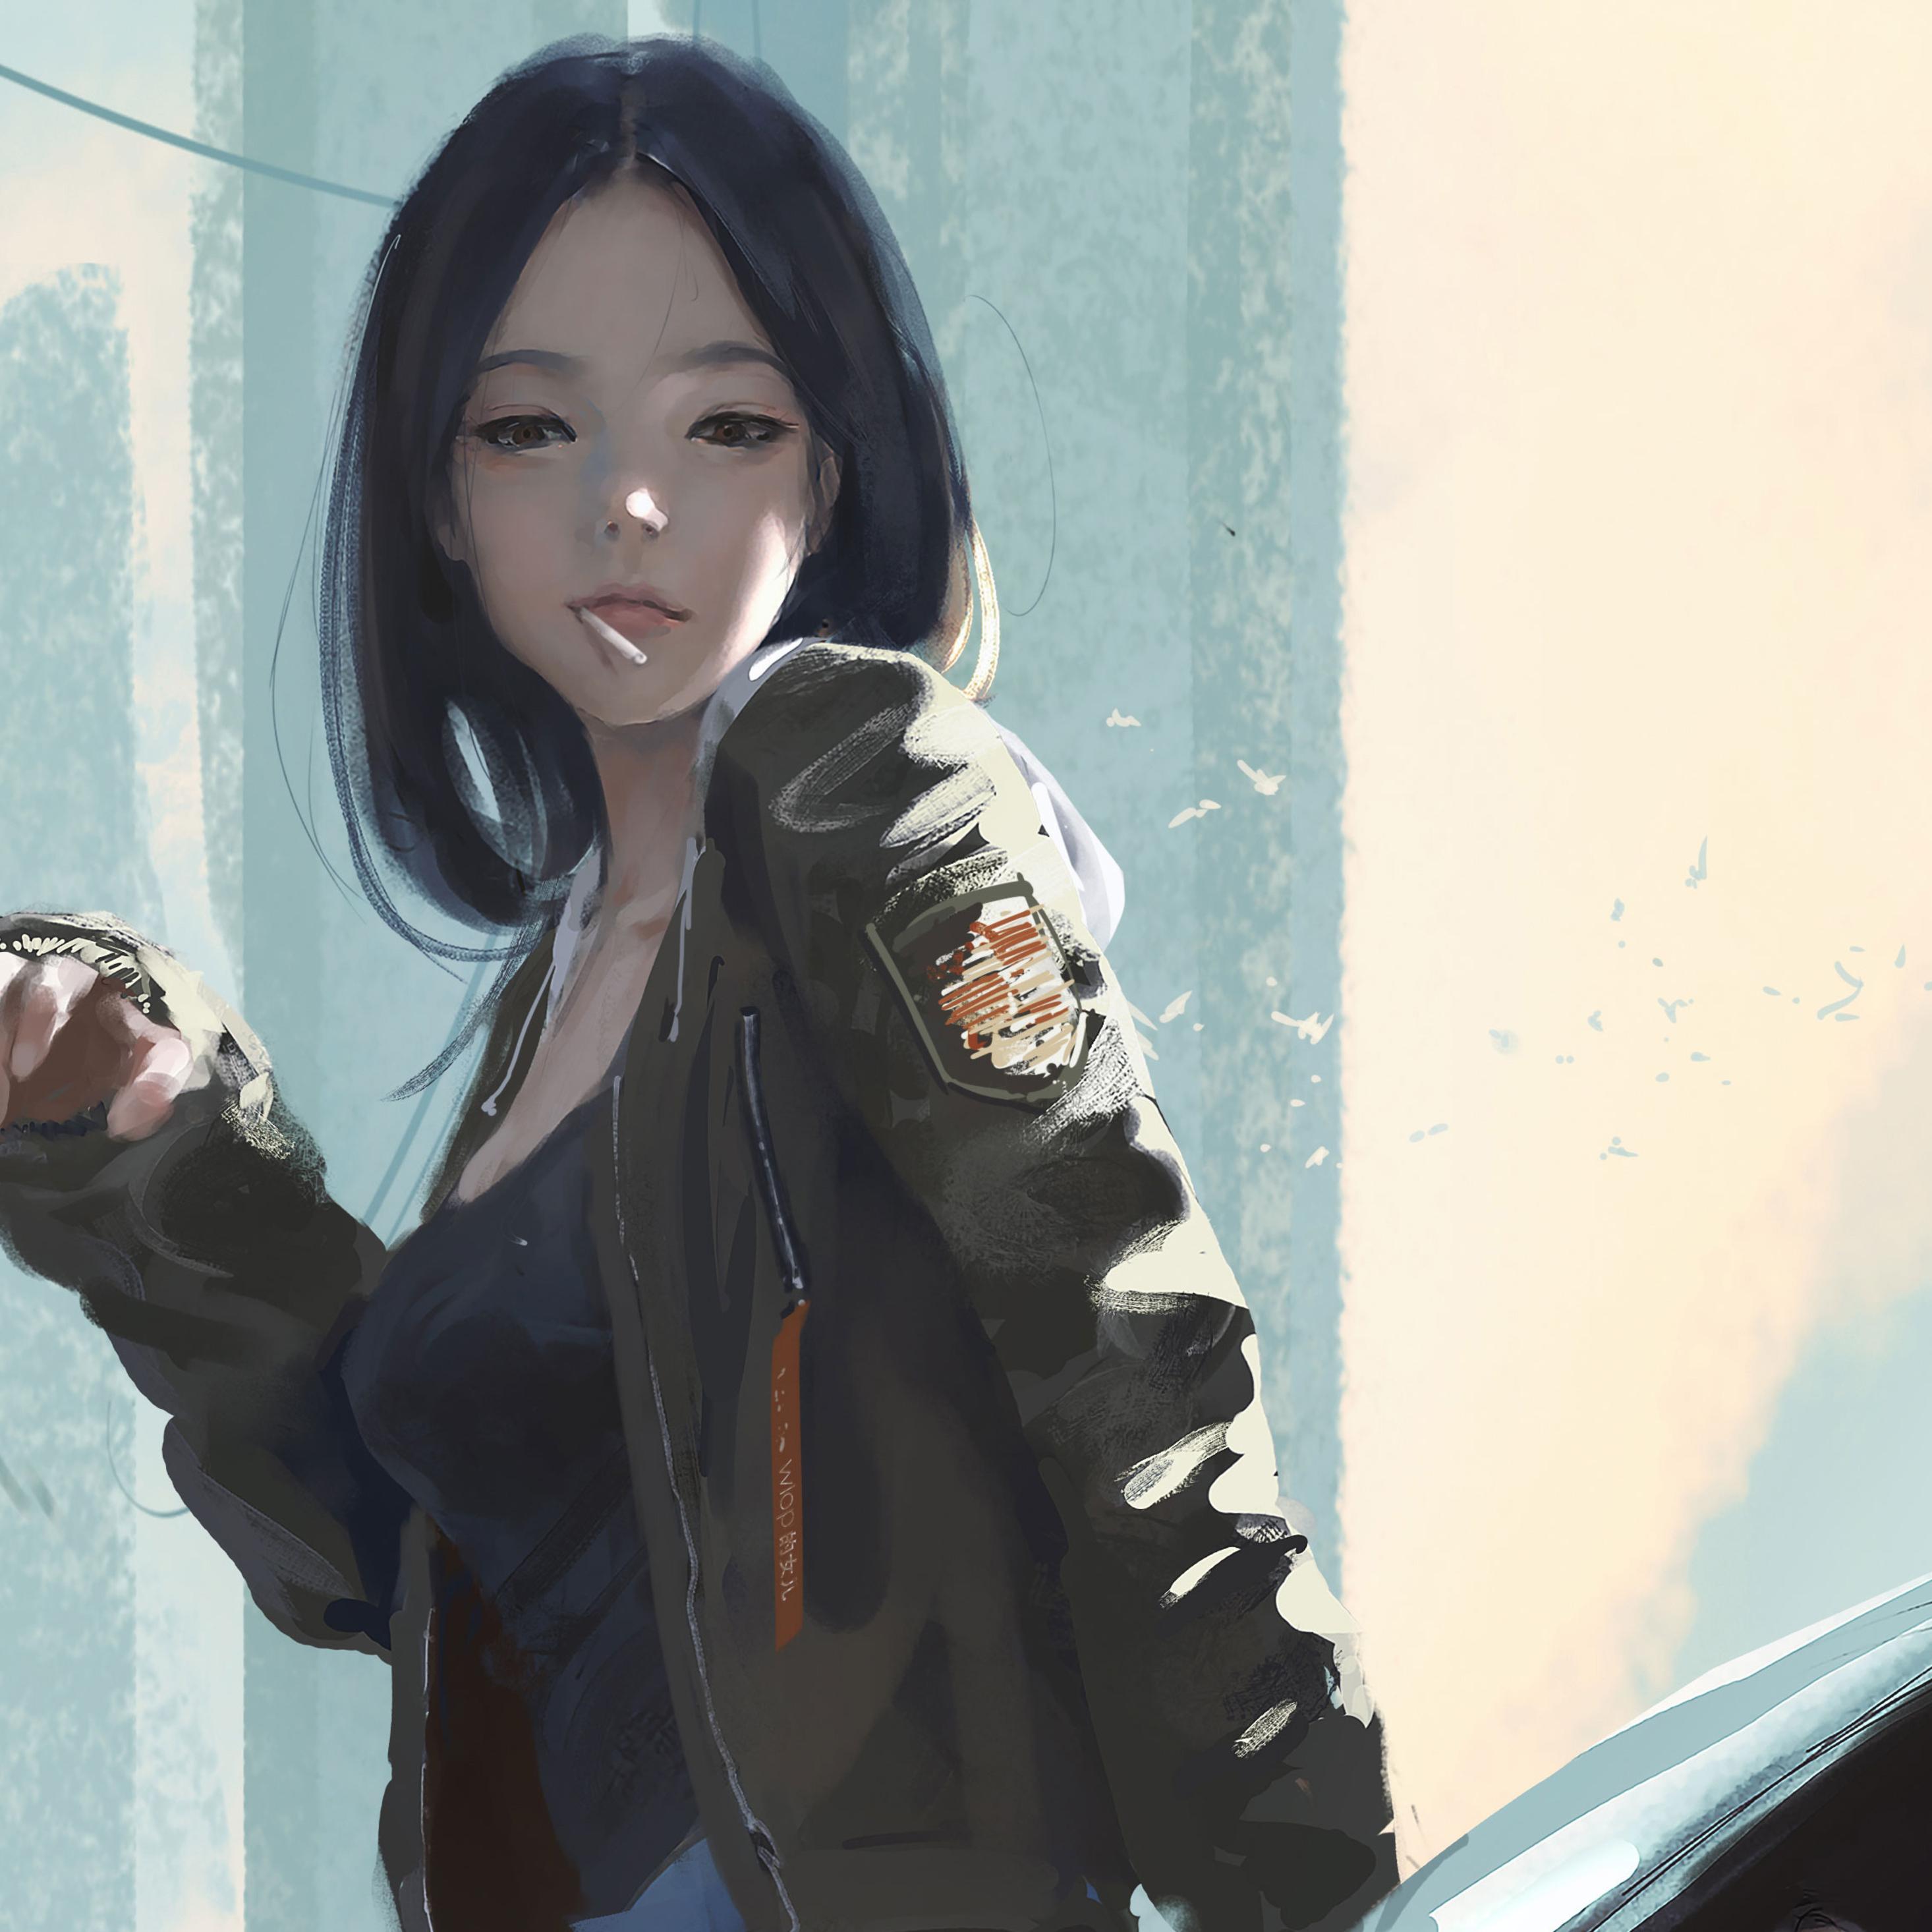 anime-biker-girl-j9.jpg